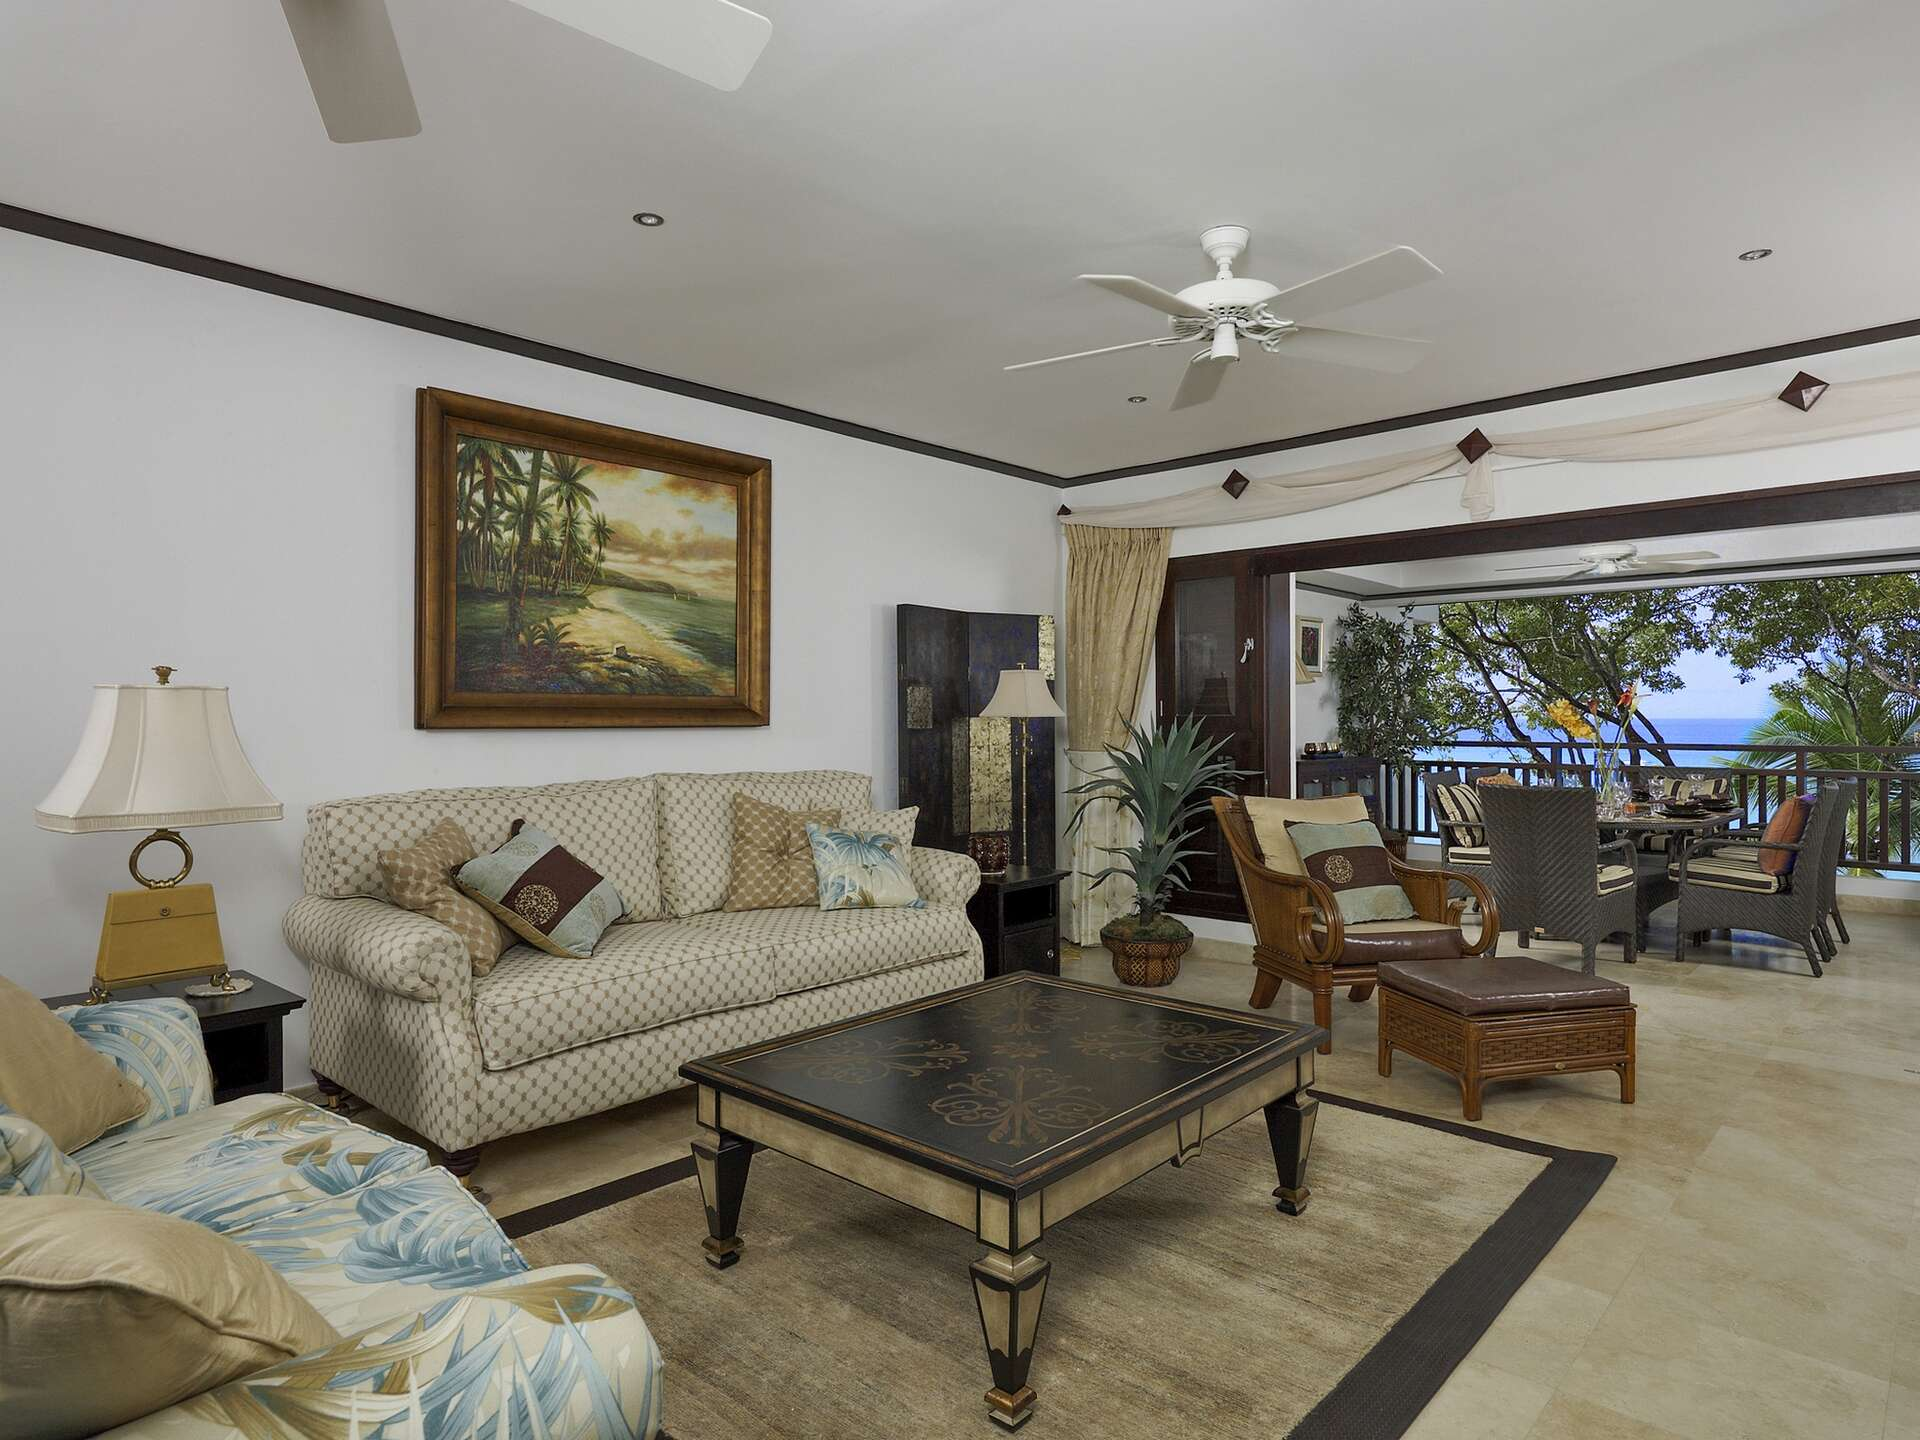 Luxury villa rentals caribbean - Barbados - St james - Coral cove - 12 Coral Cove - Image 1/8